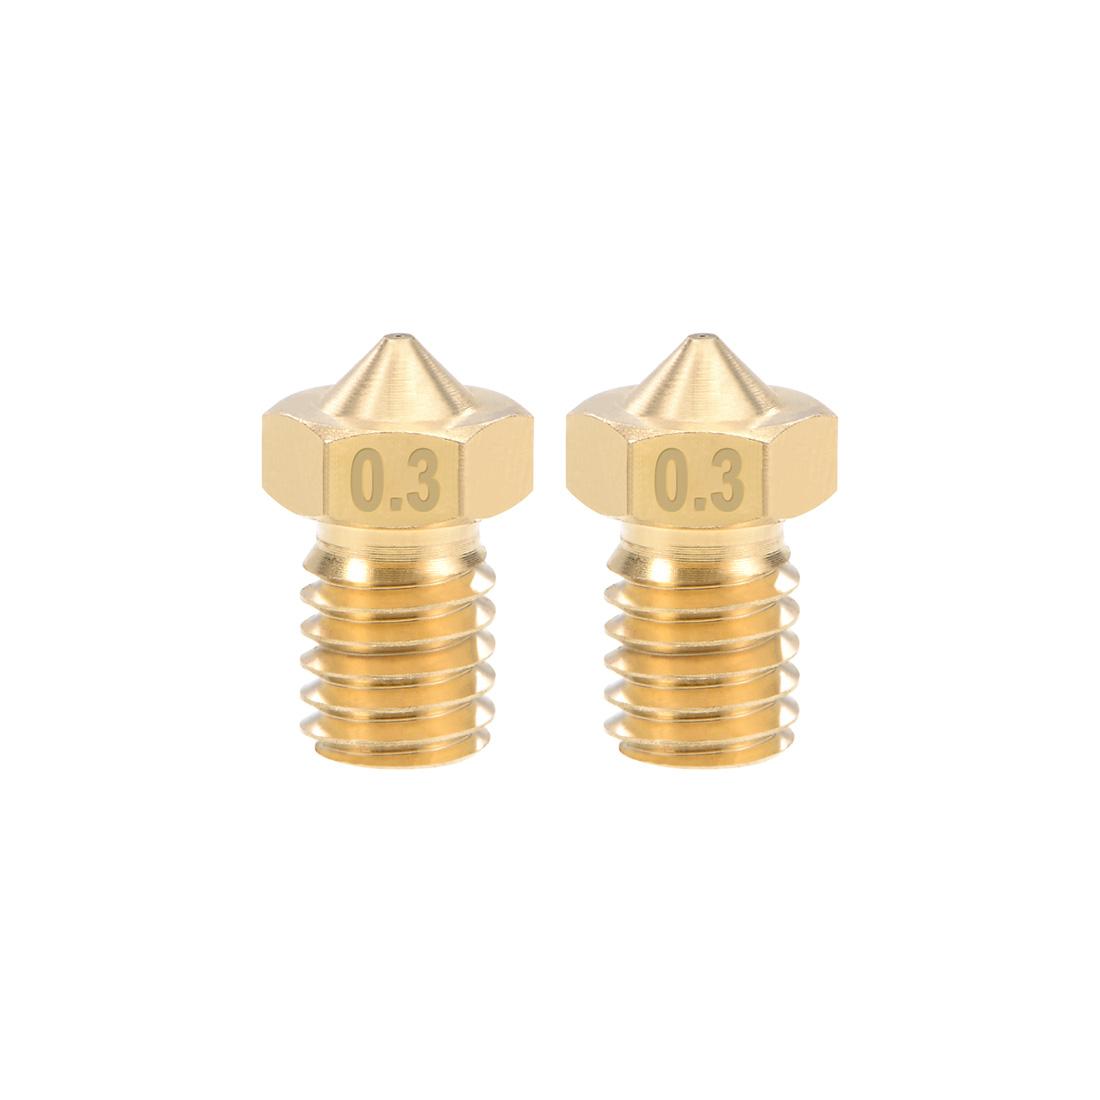 0.3mm 3D Printer Nozzle Head M6 Thread V5 V6 3mm Extruder Print Brass 2pcs